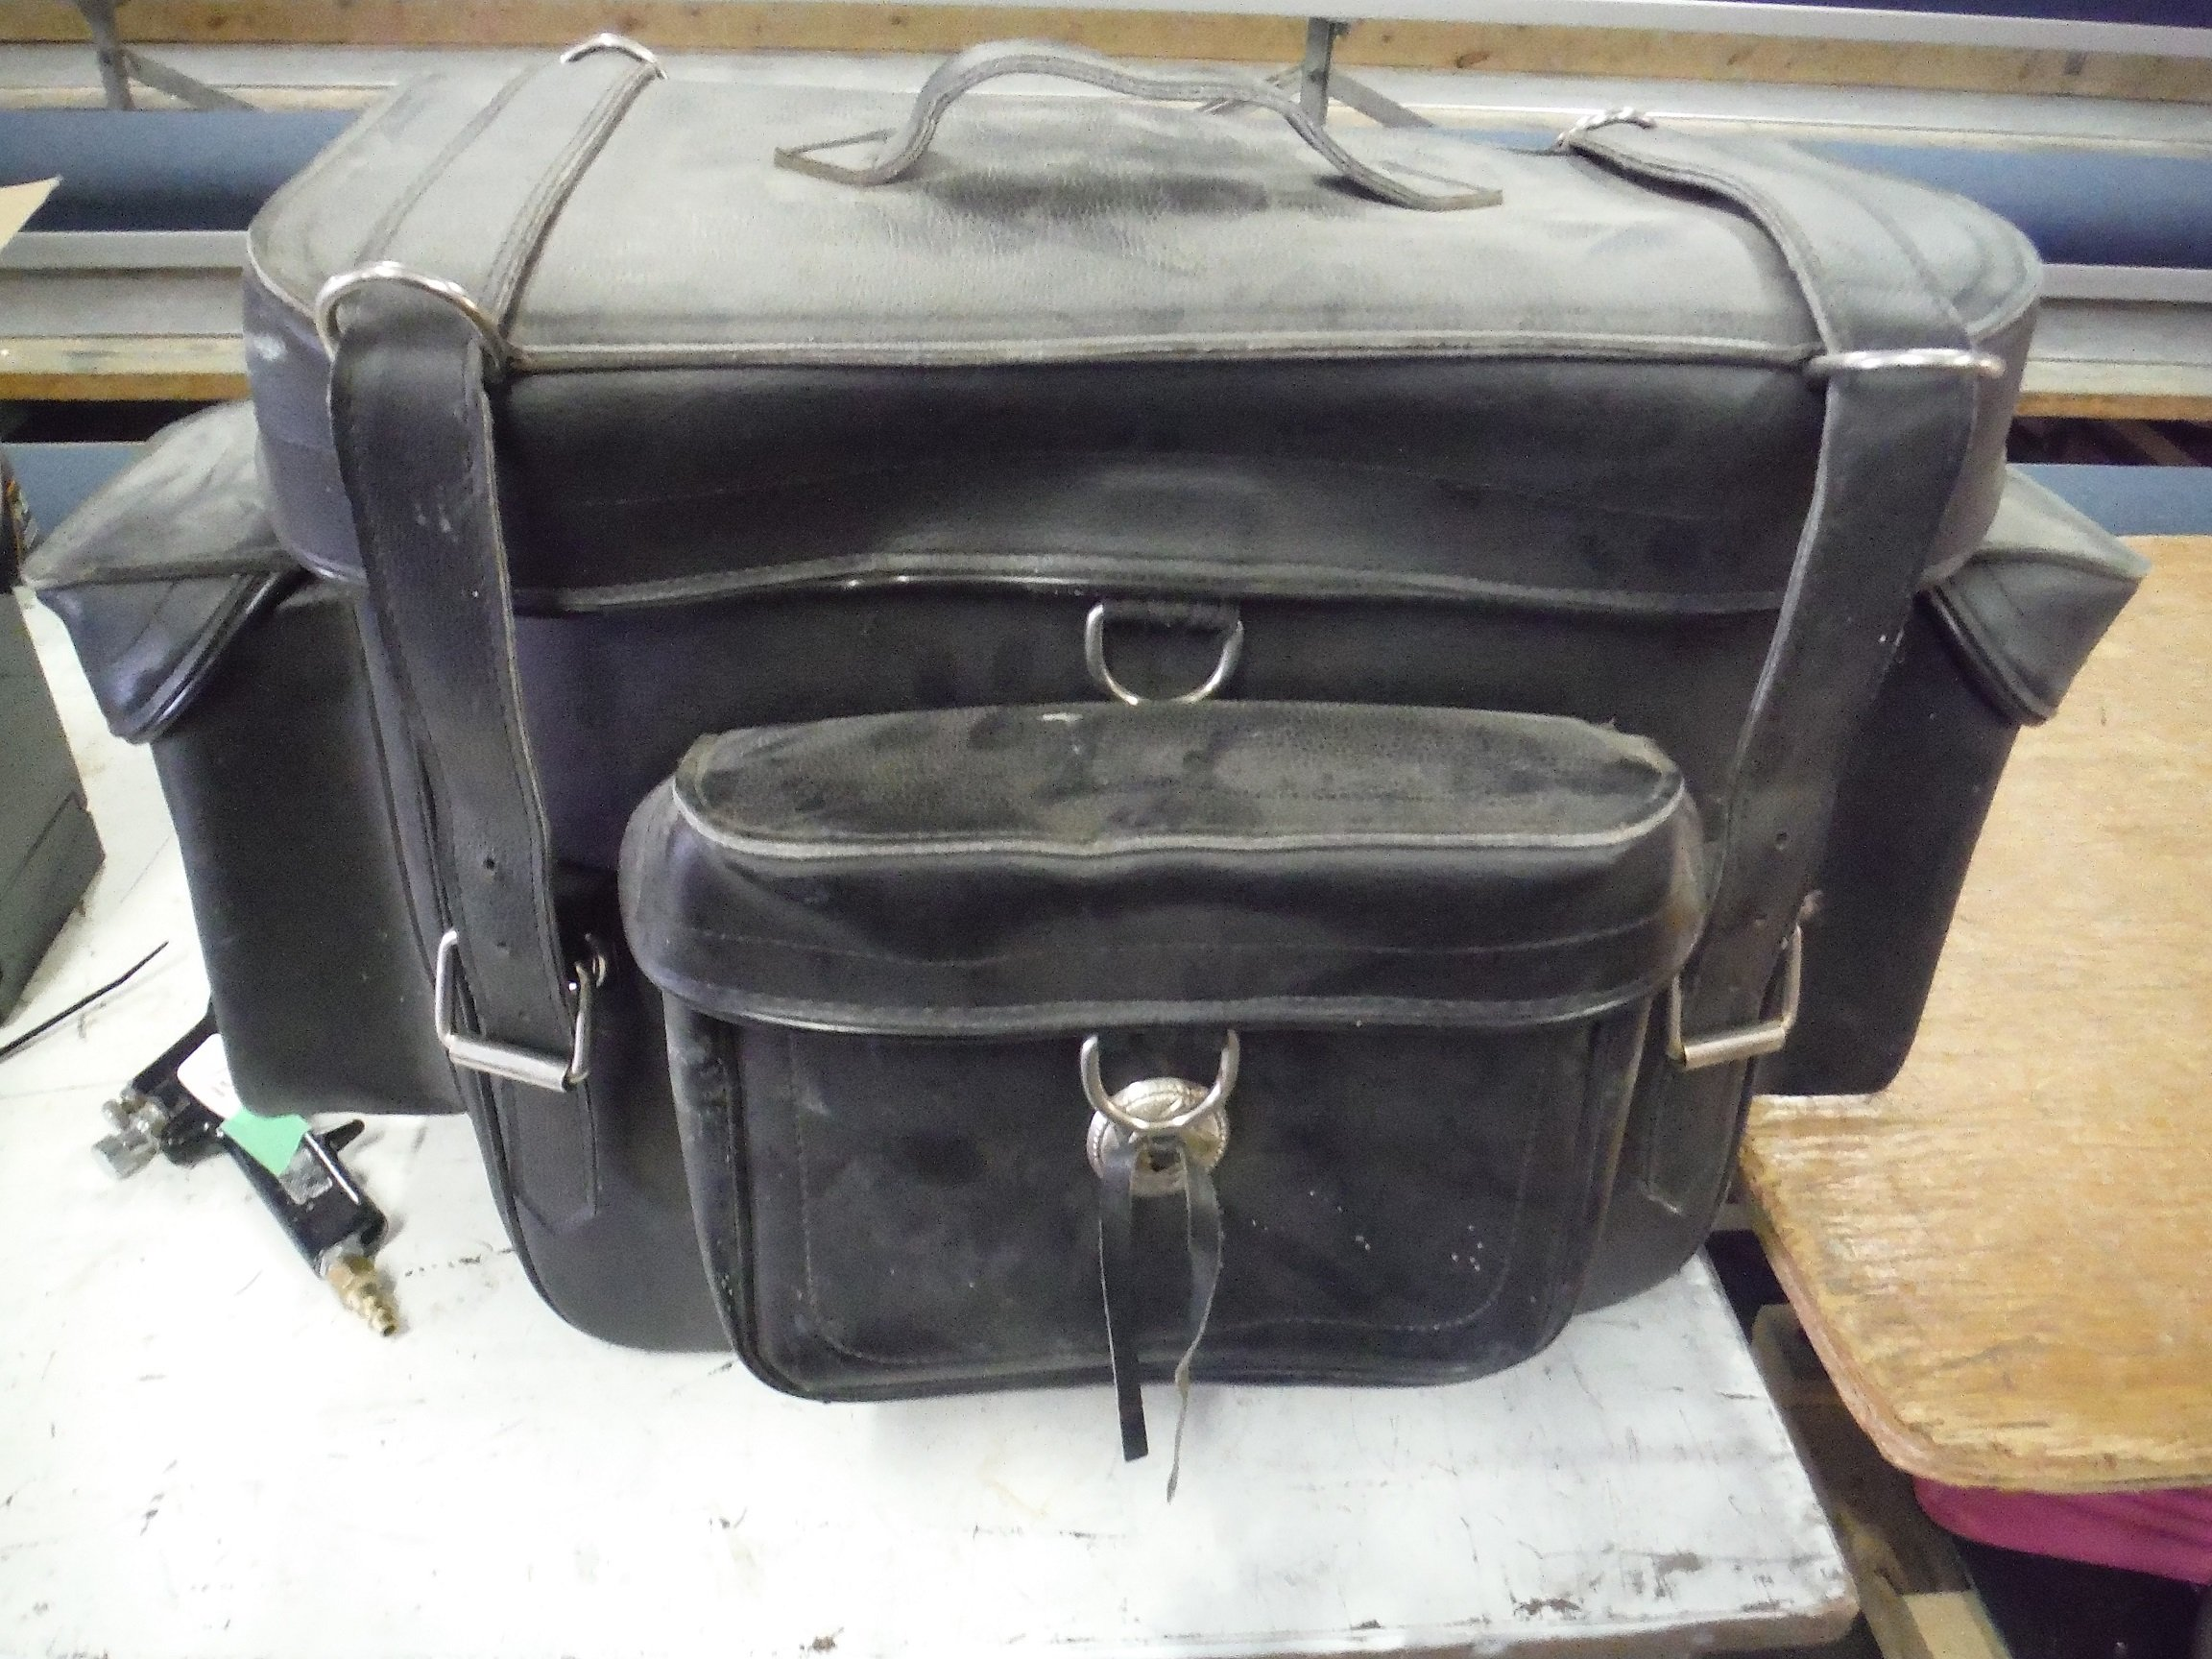 https://0901.nccdn.net/4_2/000/000/002/30a/leatherbag.jpg